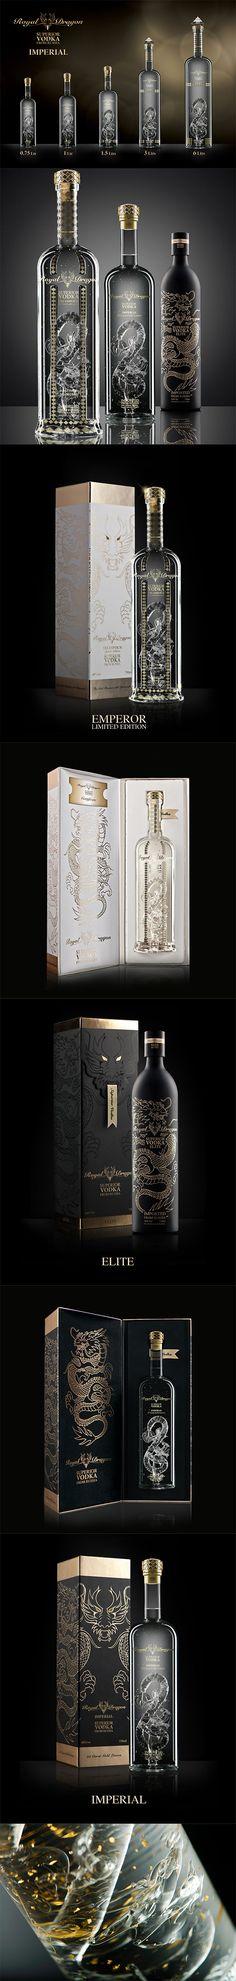 Royal Dragon Vodka Superior Vodka from Russia